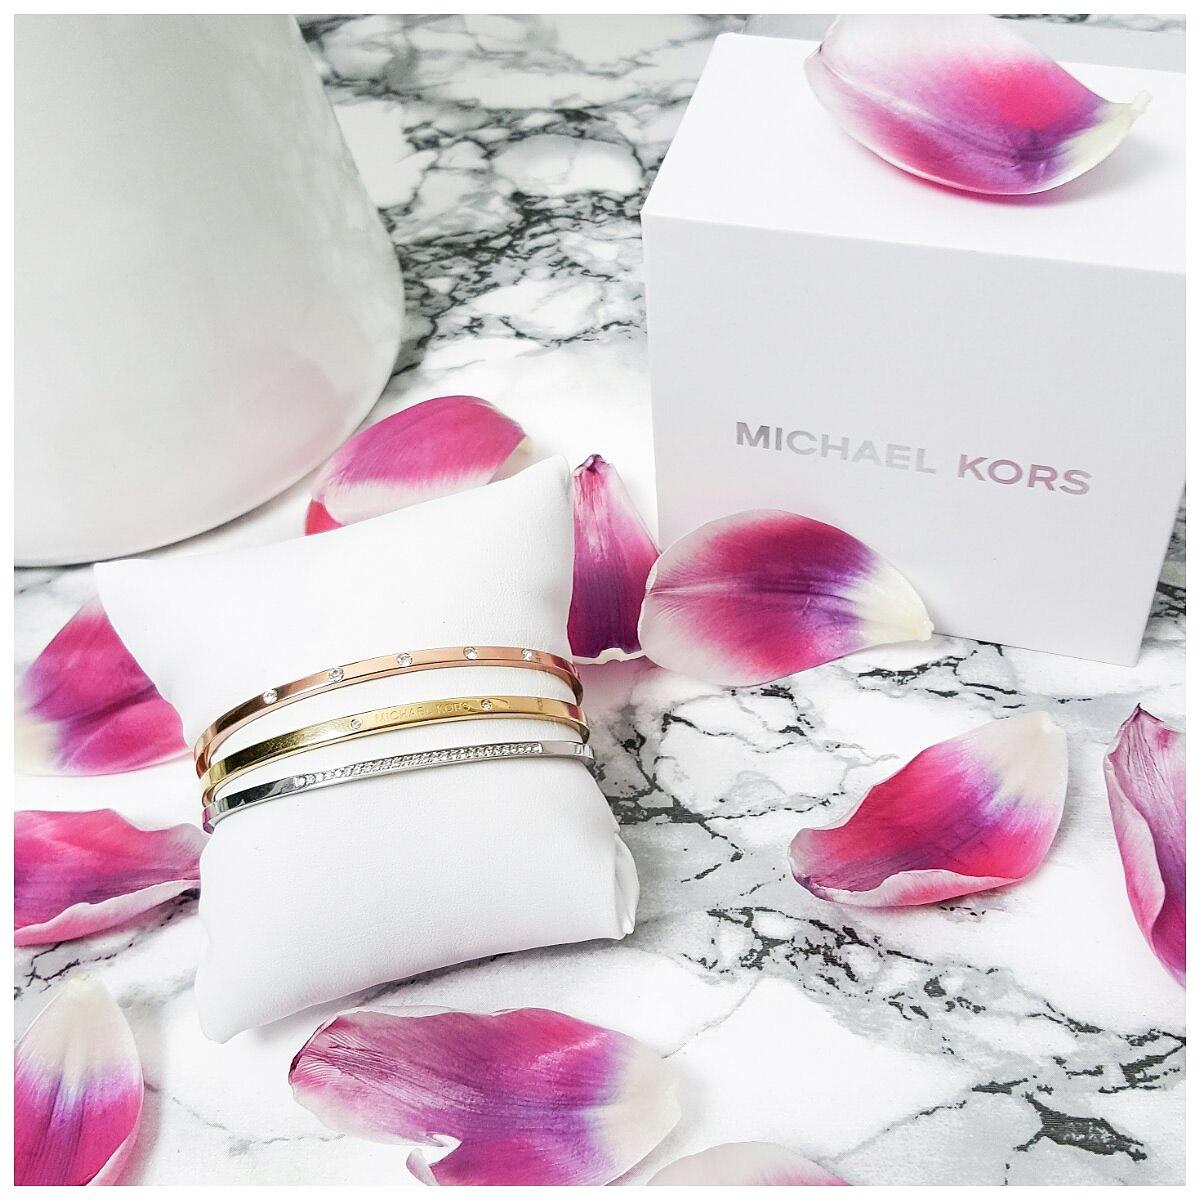 Bild Armband Michael Kors Gold Silber Rosegold, Blogger, Shades of Ivory